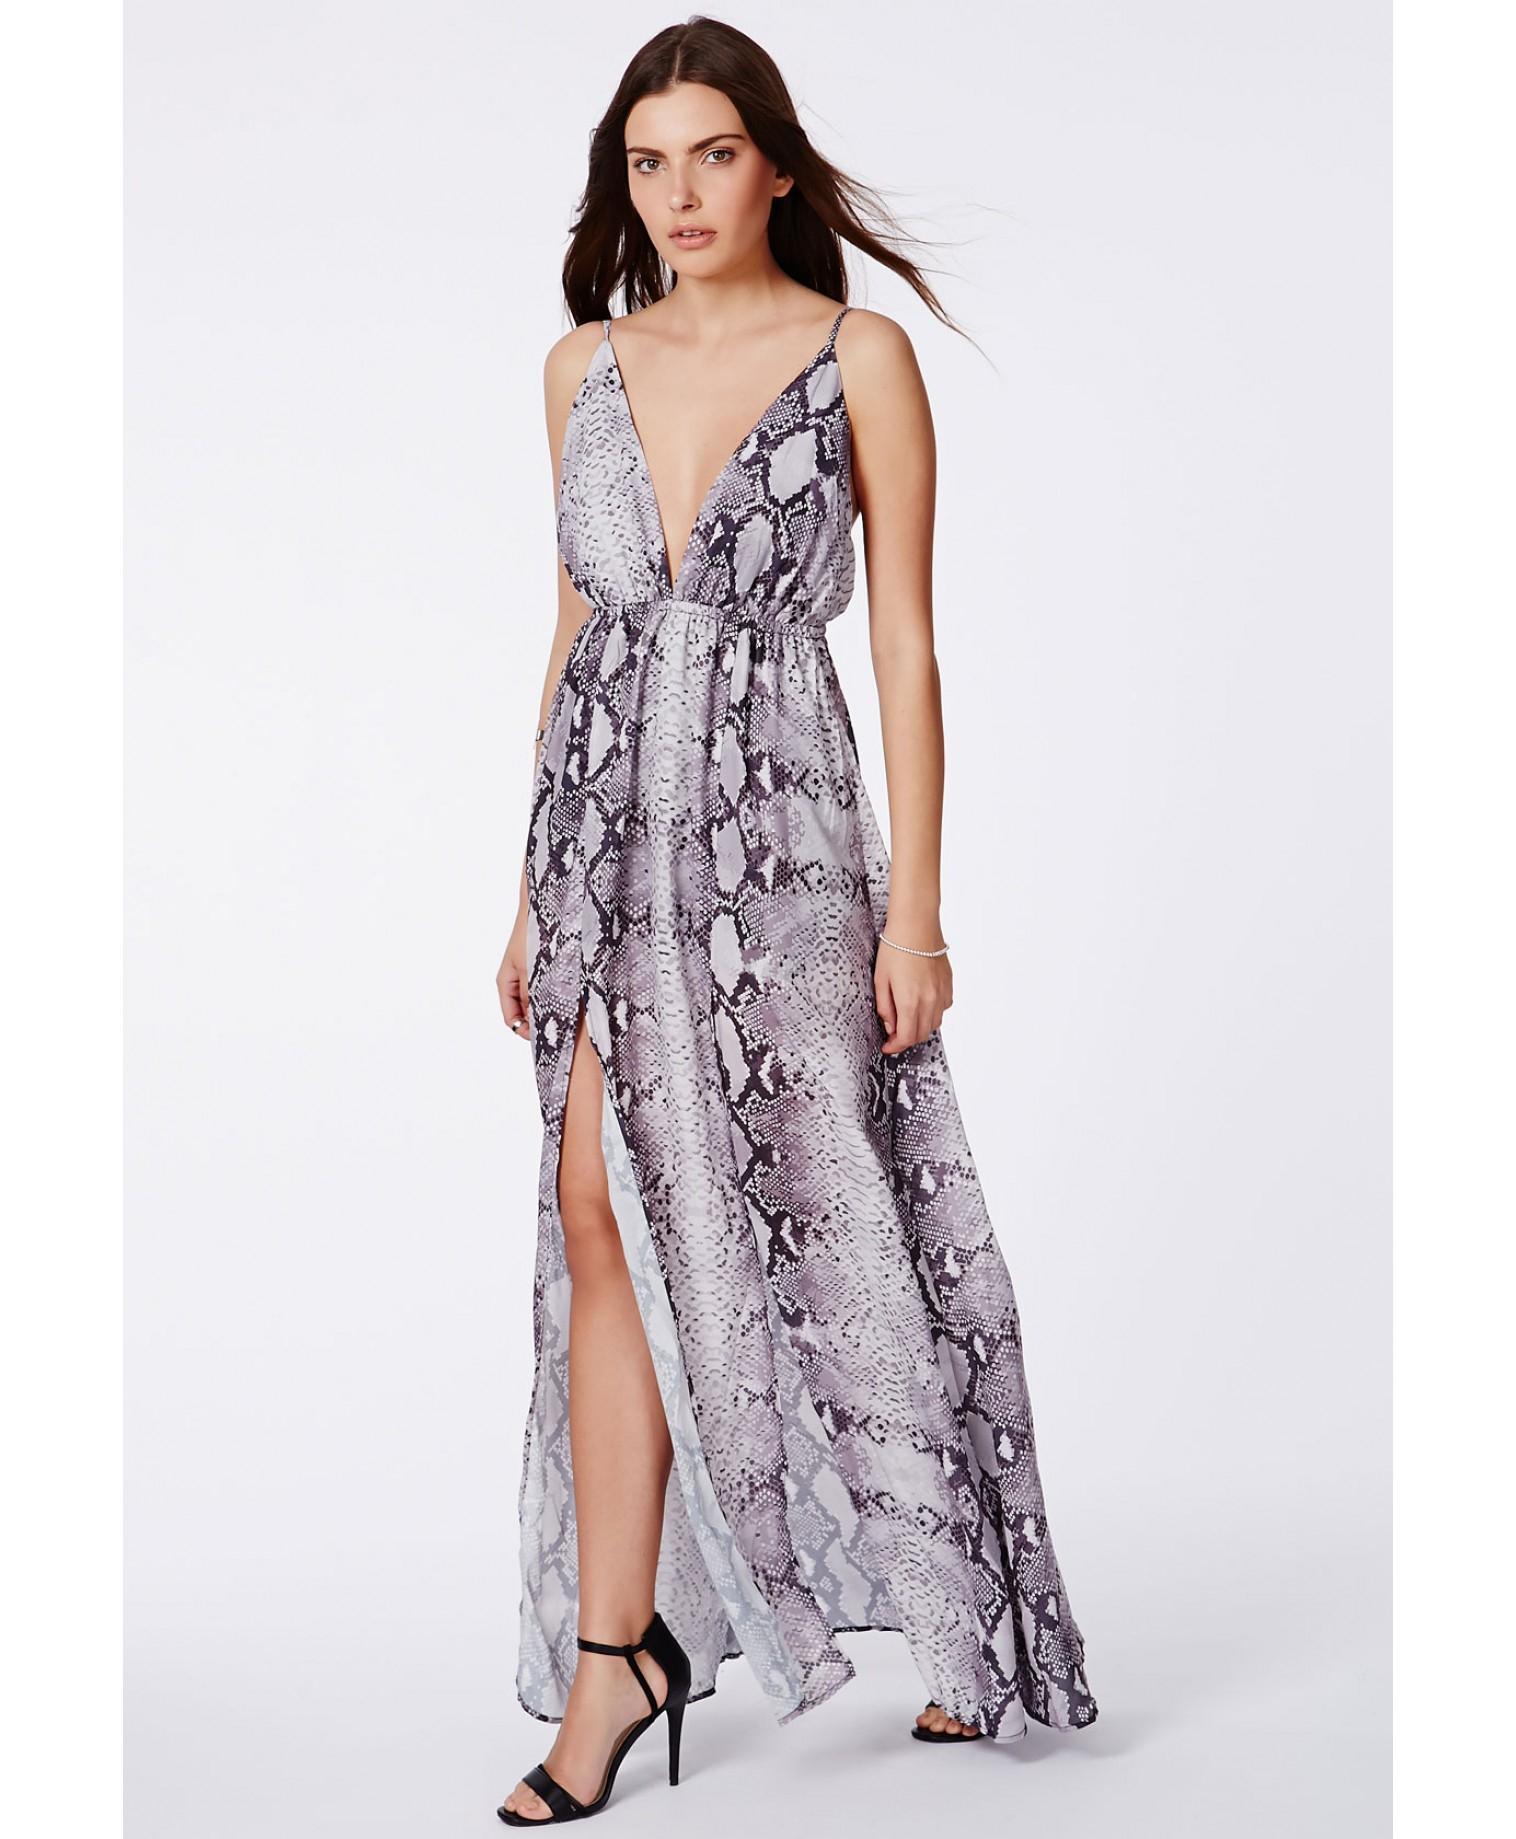 Snake Skin Cocktail Dresses